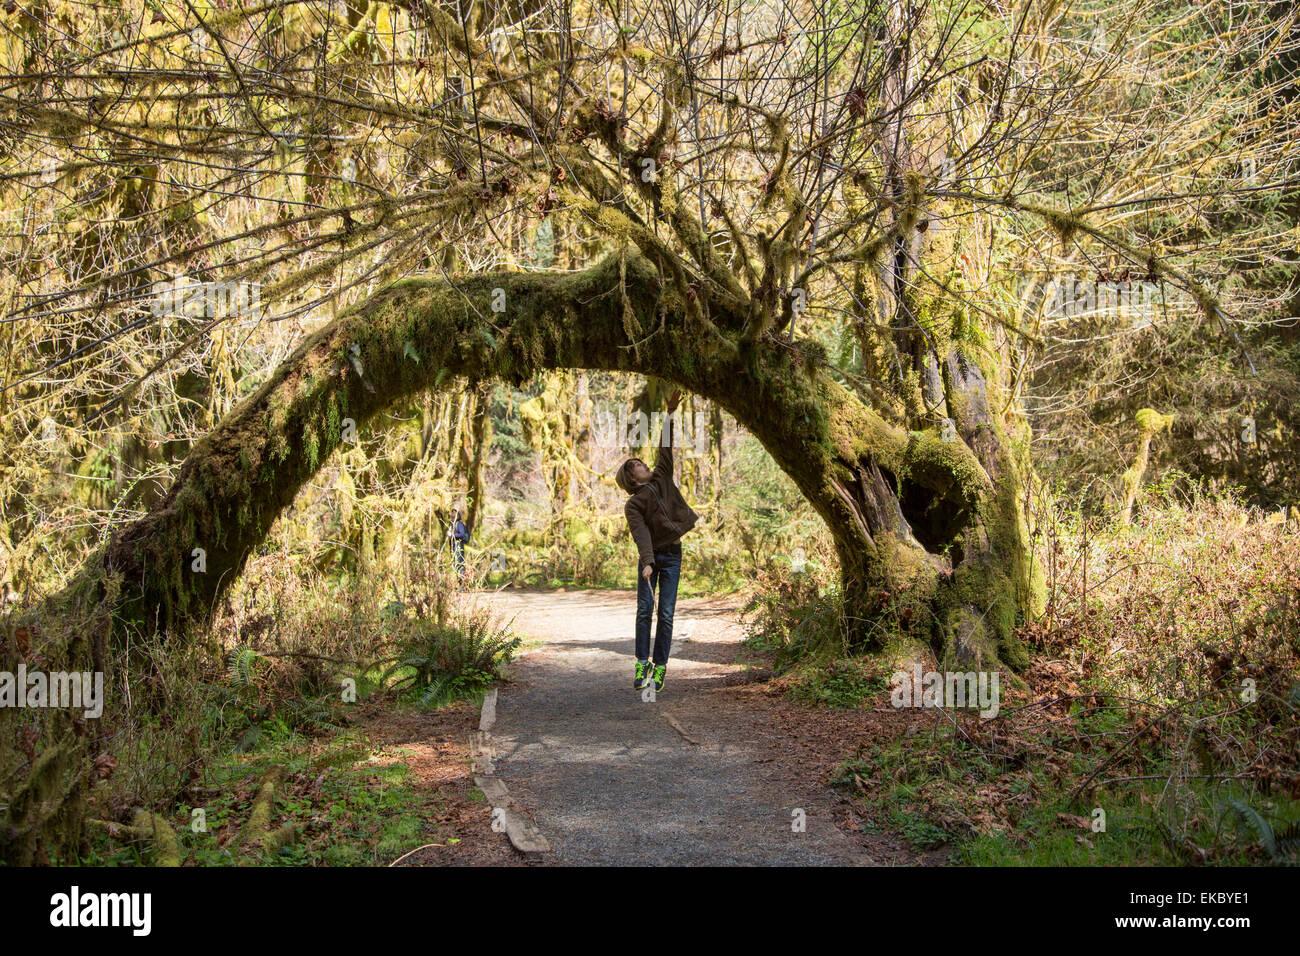 Olympic National Park, Hoh Rainforest, Washington State, USA - Stock Image